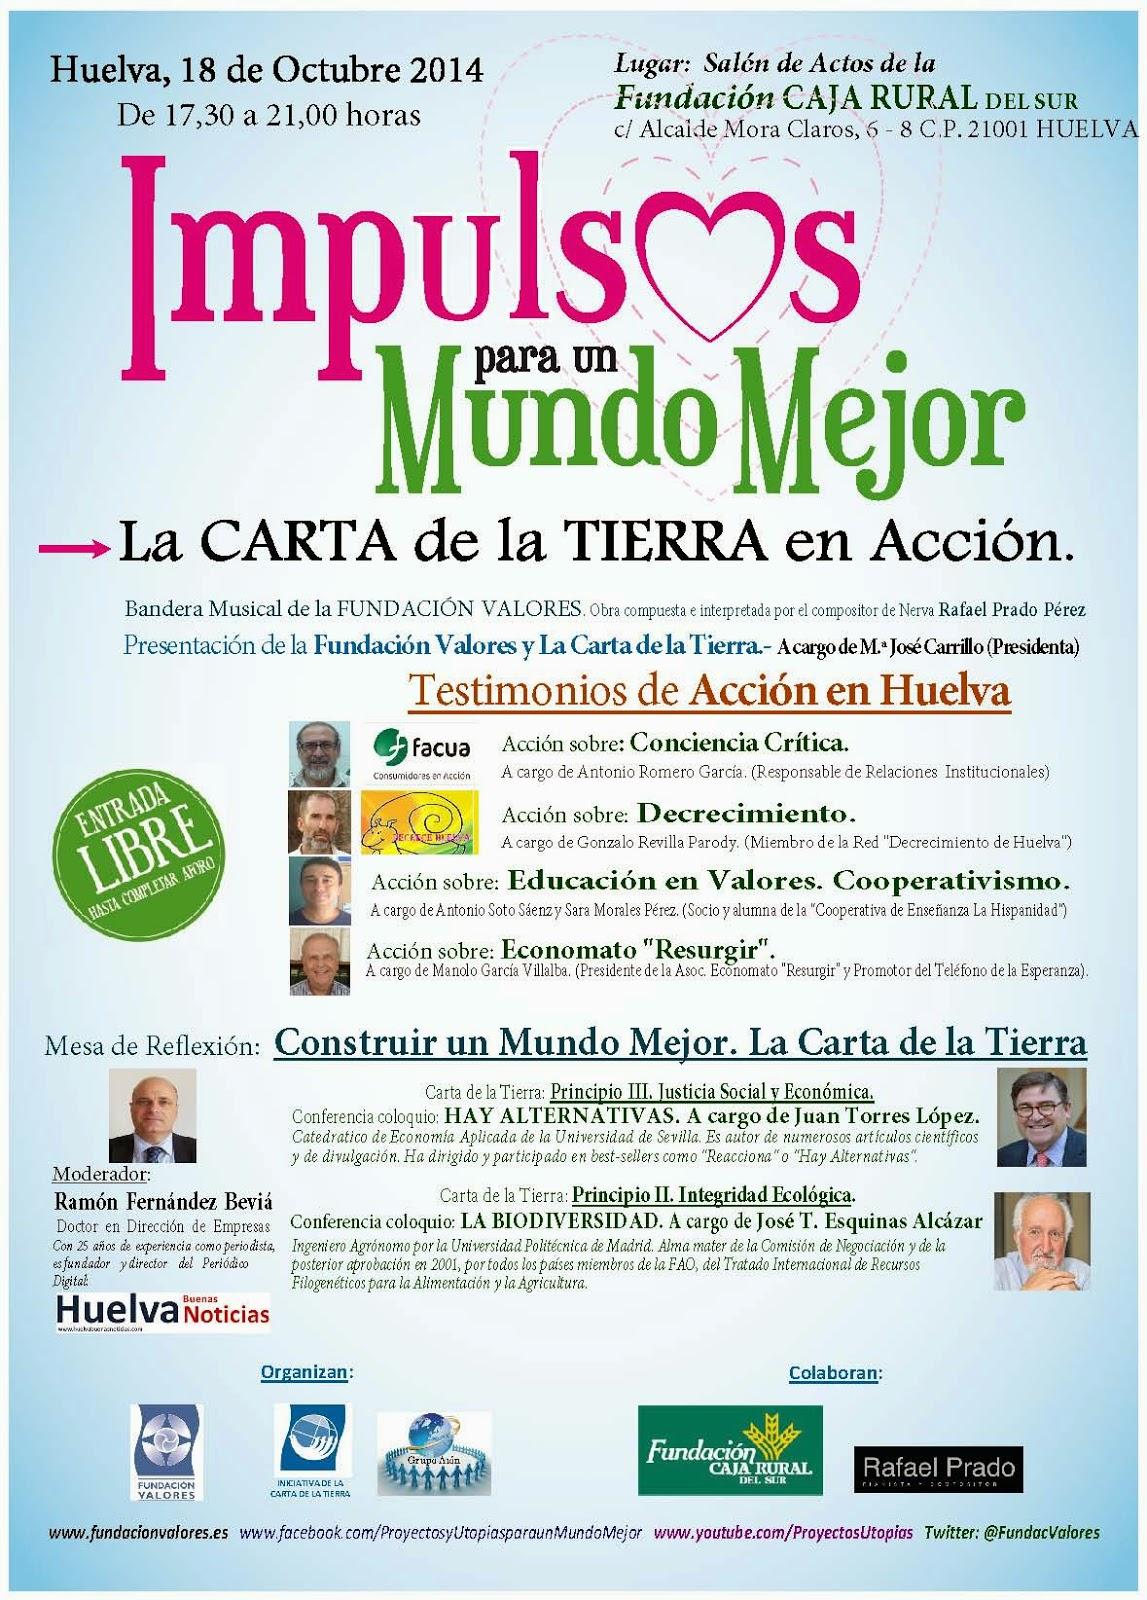 http://www.fundacionvalores.es/images/impulsos/20141018-TripticoImpulsoHuelva.pdf